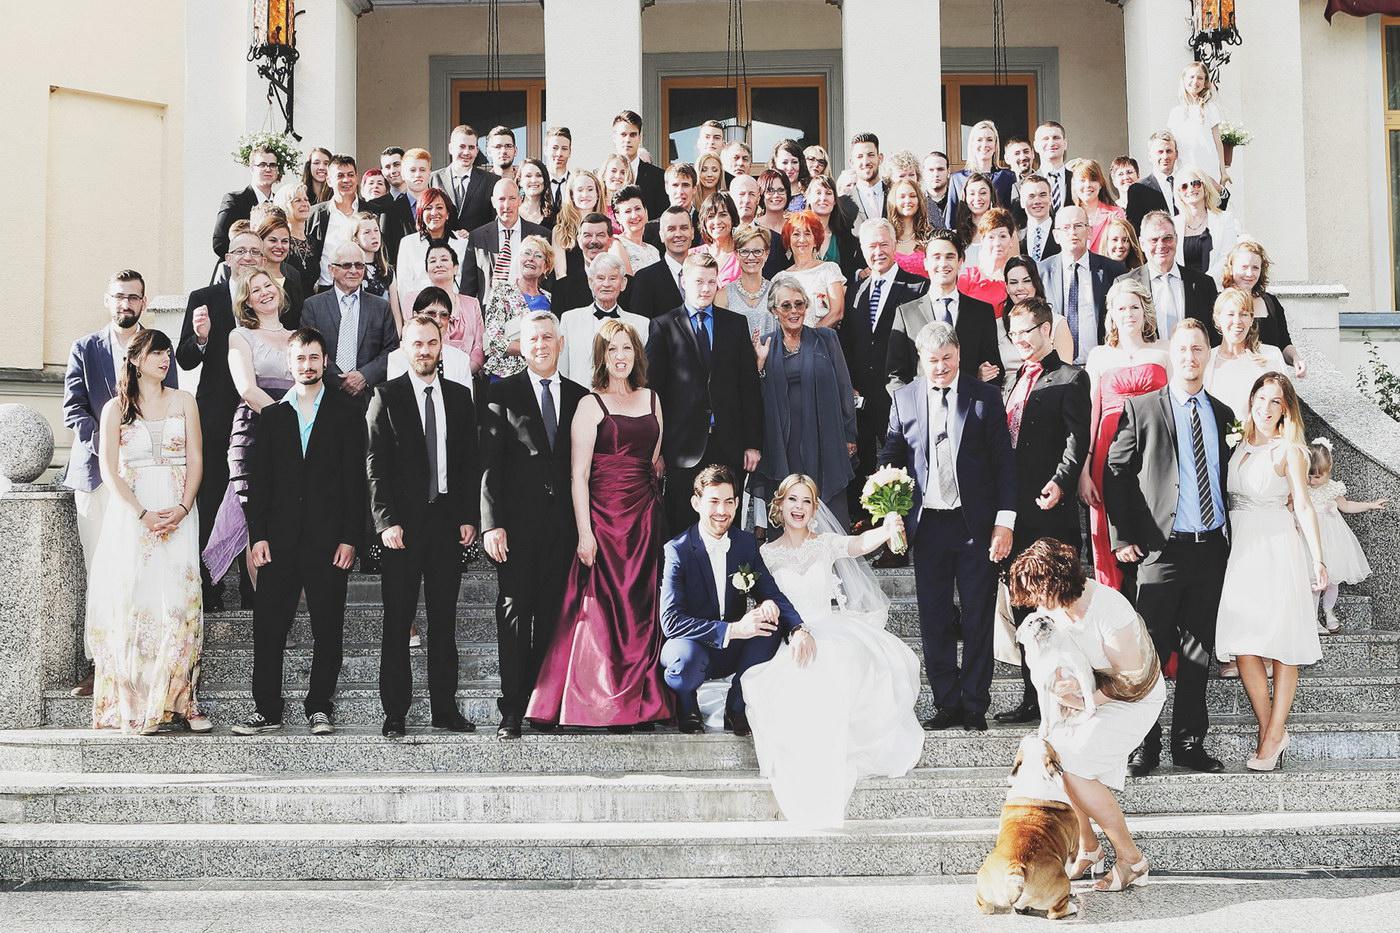 Prezenta fostilor parteneri la nunta